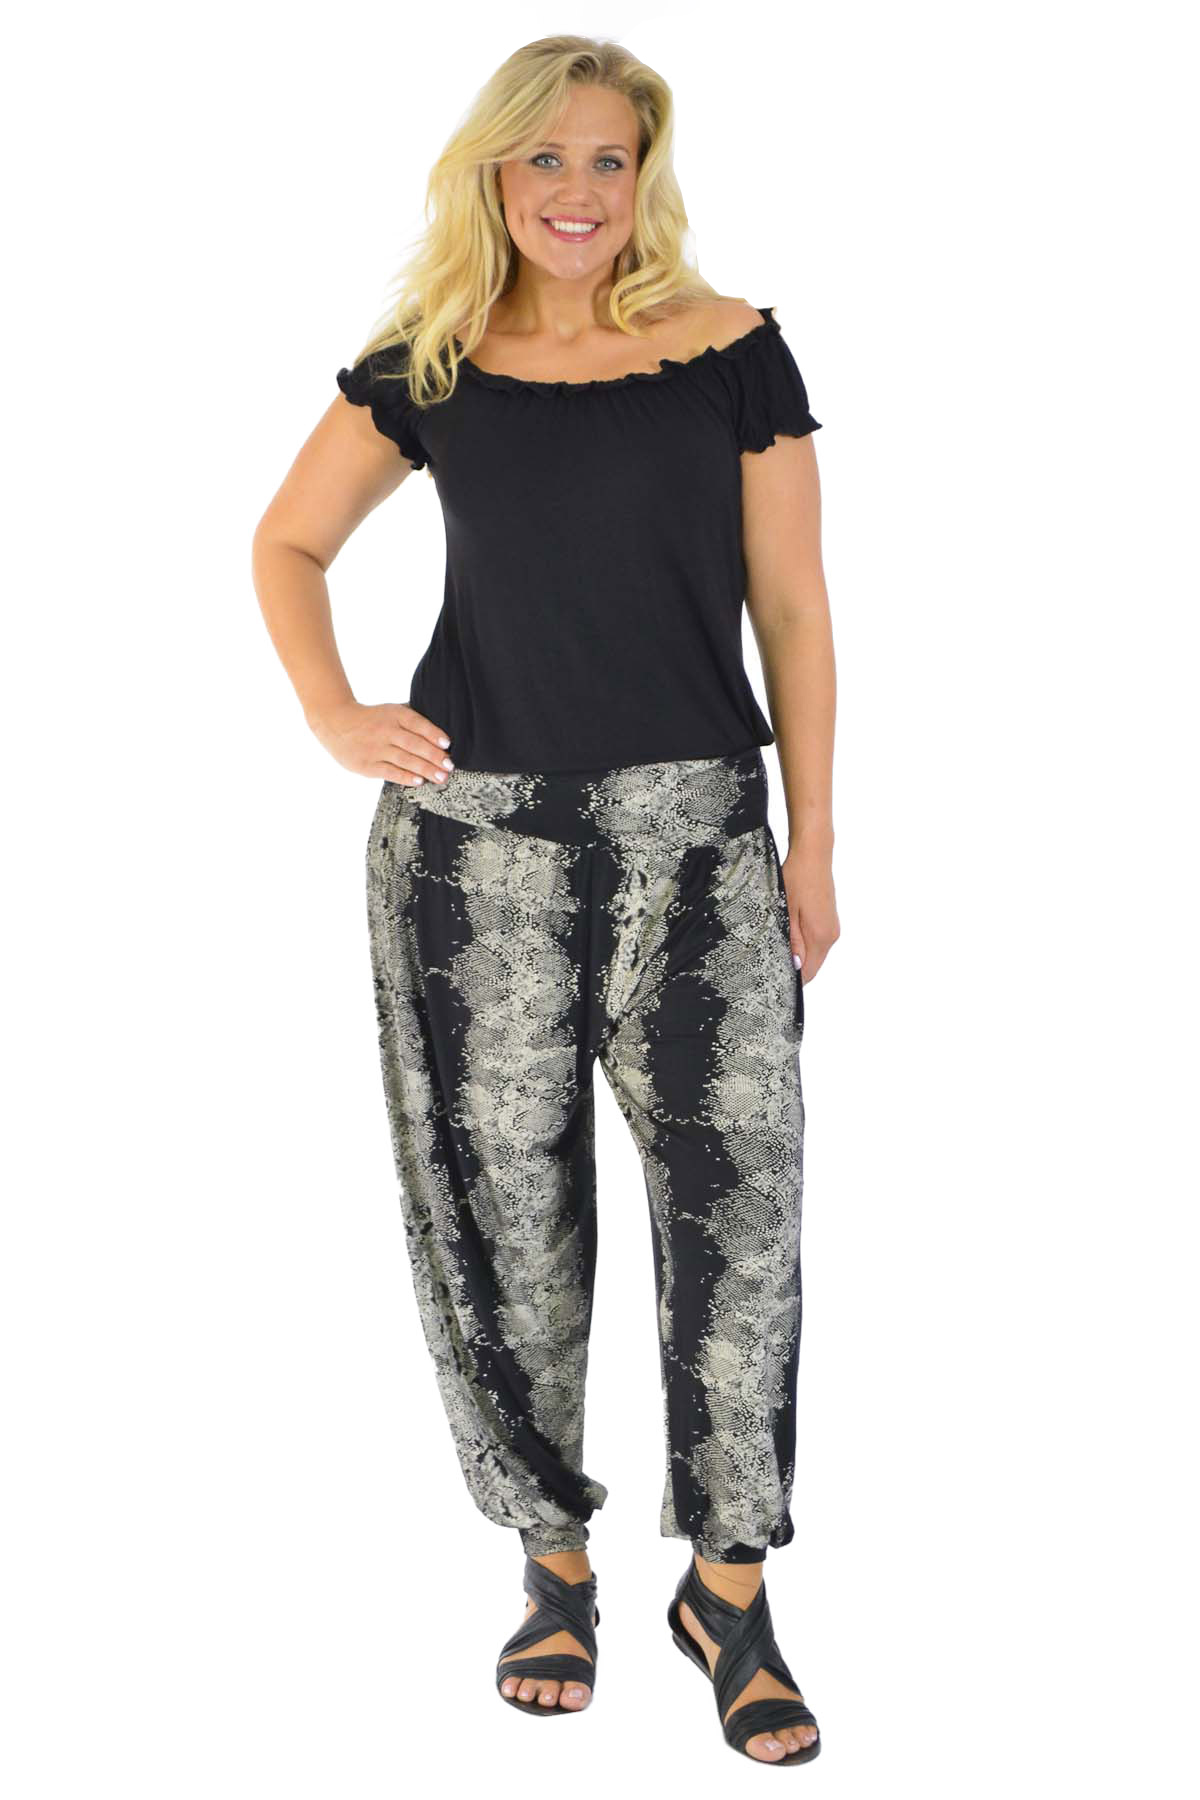 New Womens Harem Trousers Plus Size Snake Skin Print Long Ali Baba Yoga Nouvelle